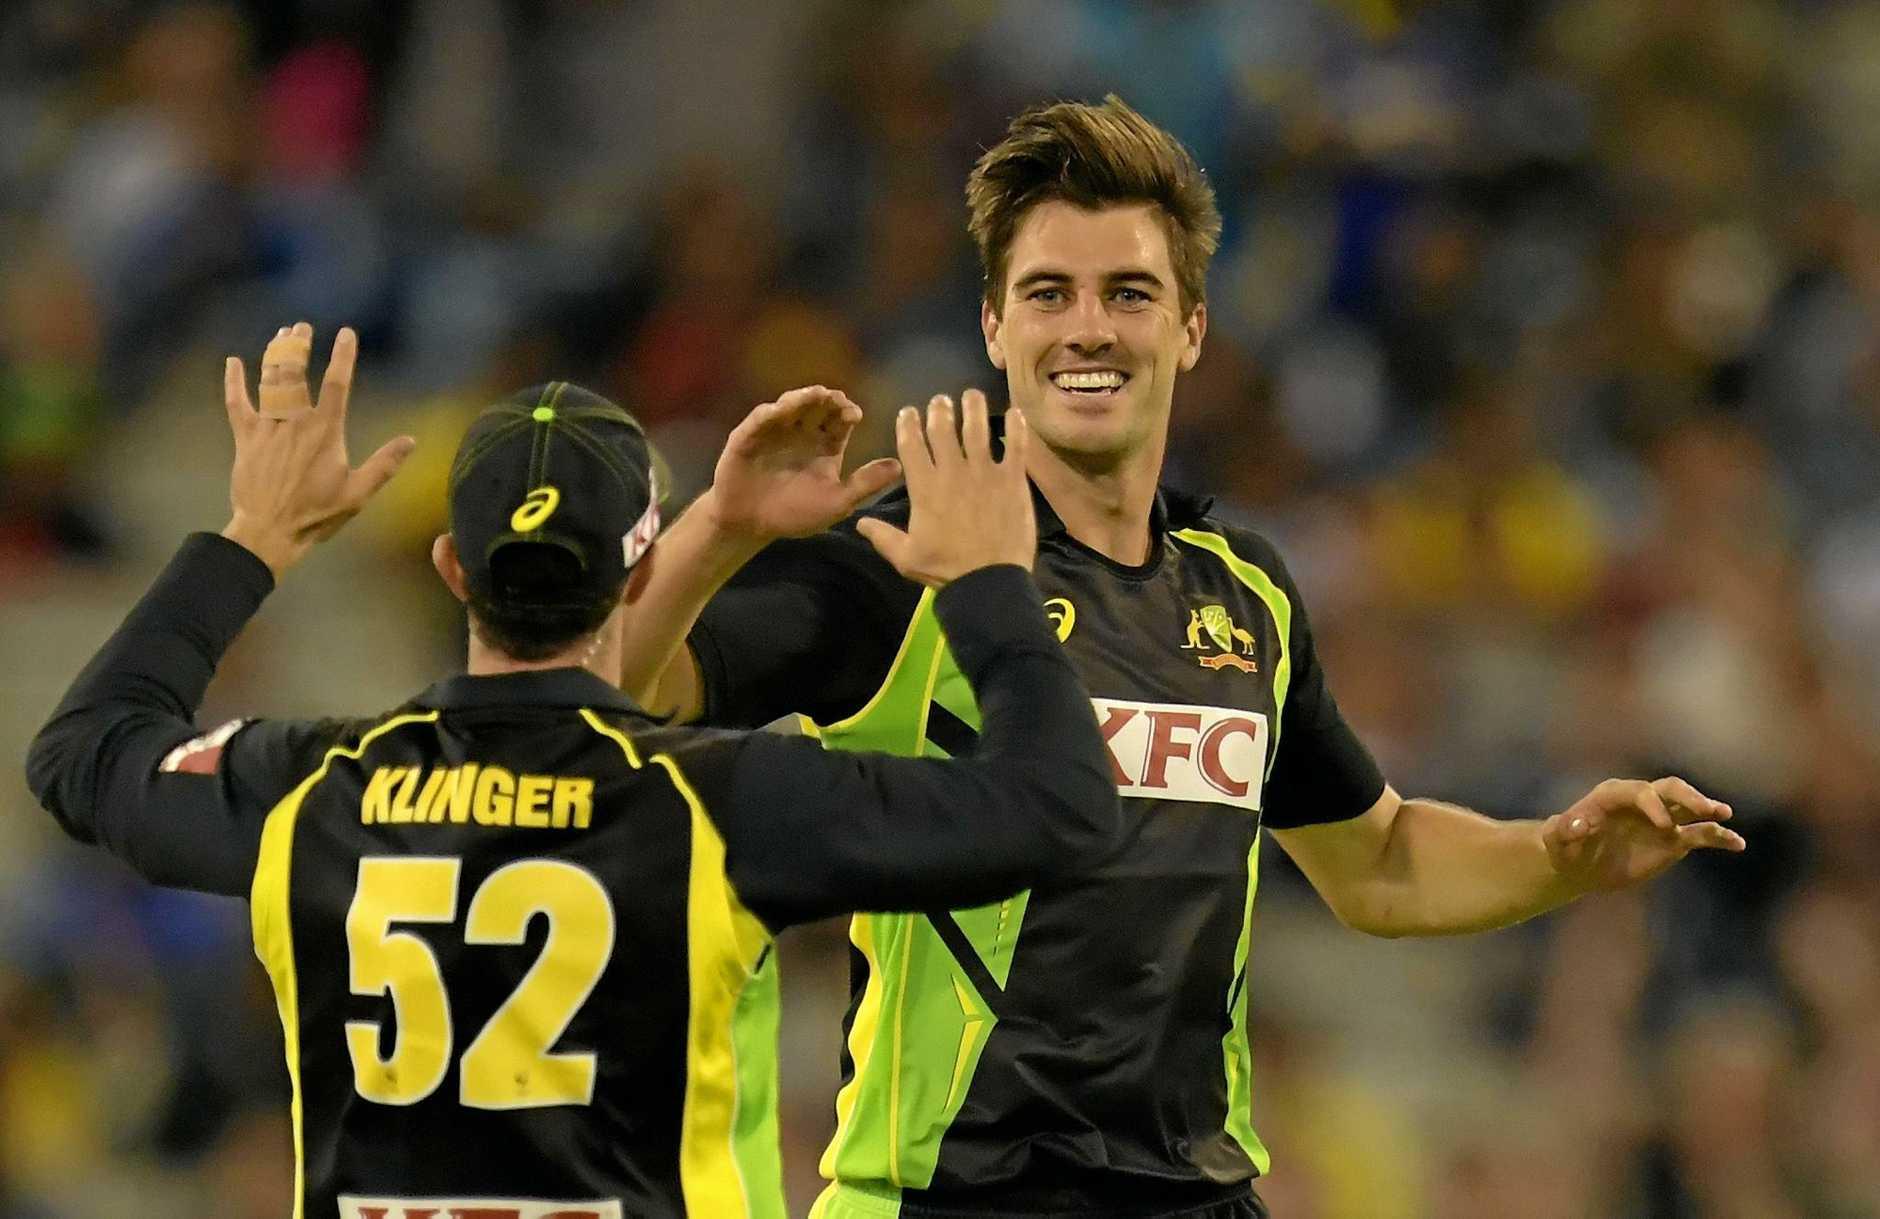 Pat Cummins takes a wicket for Australia